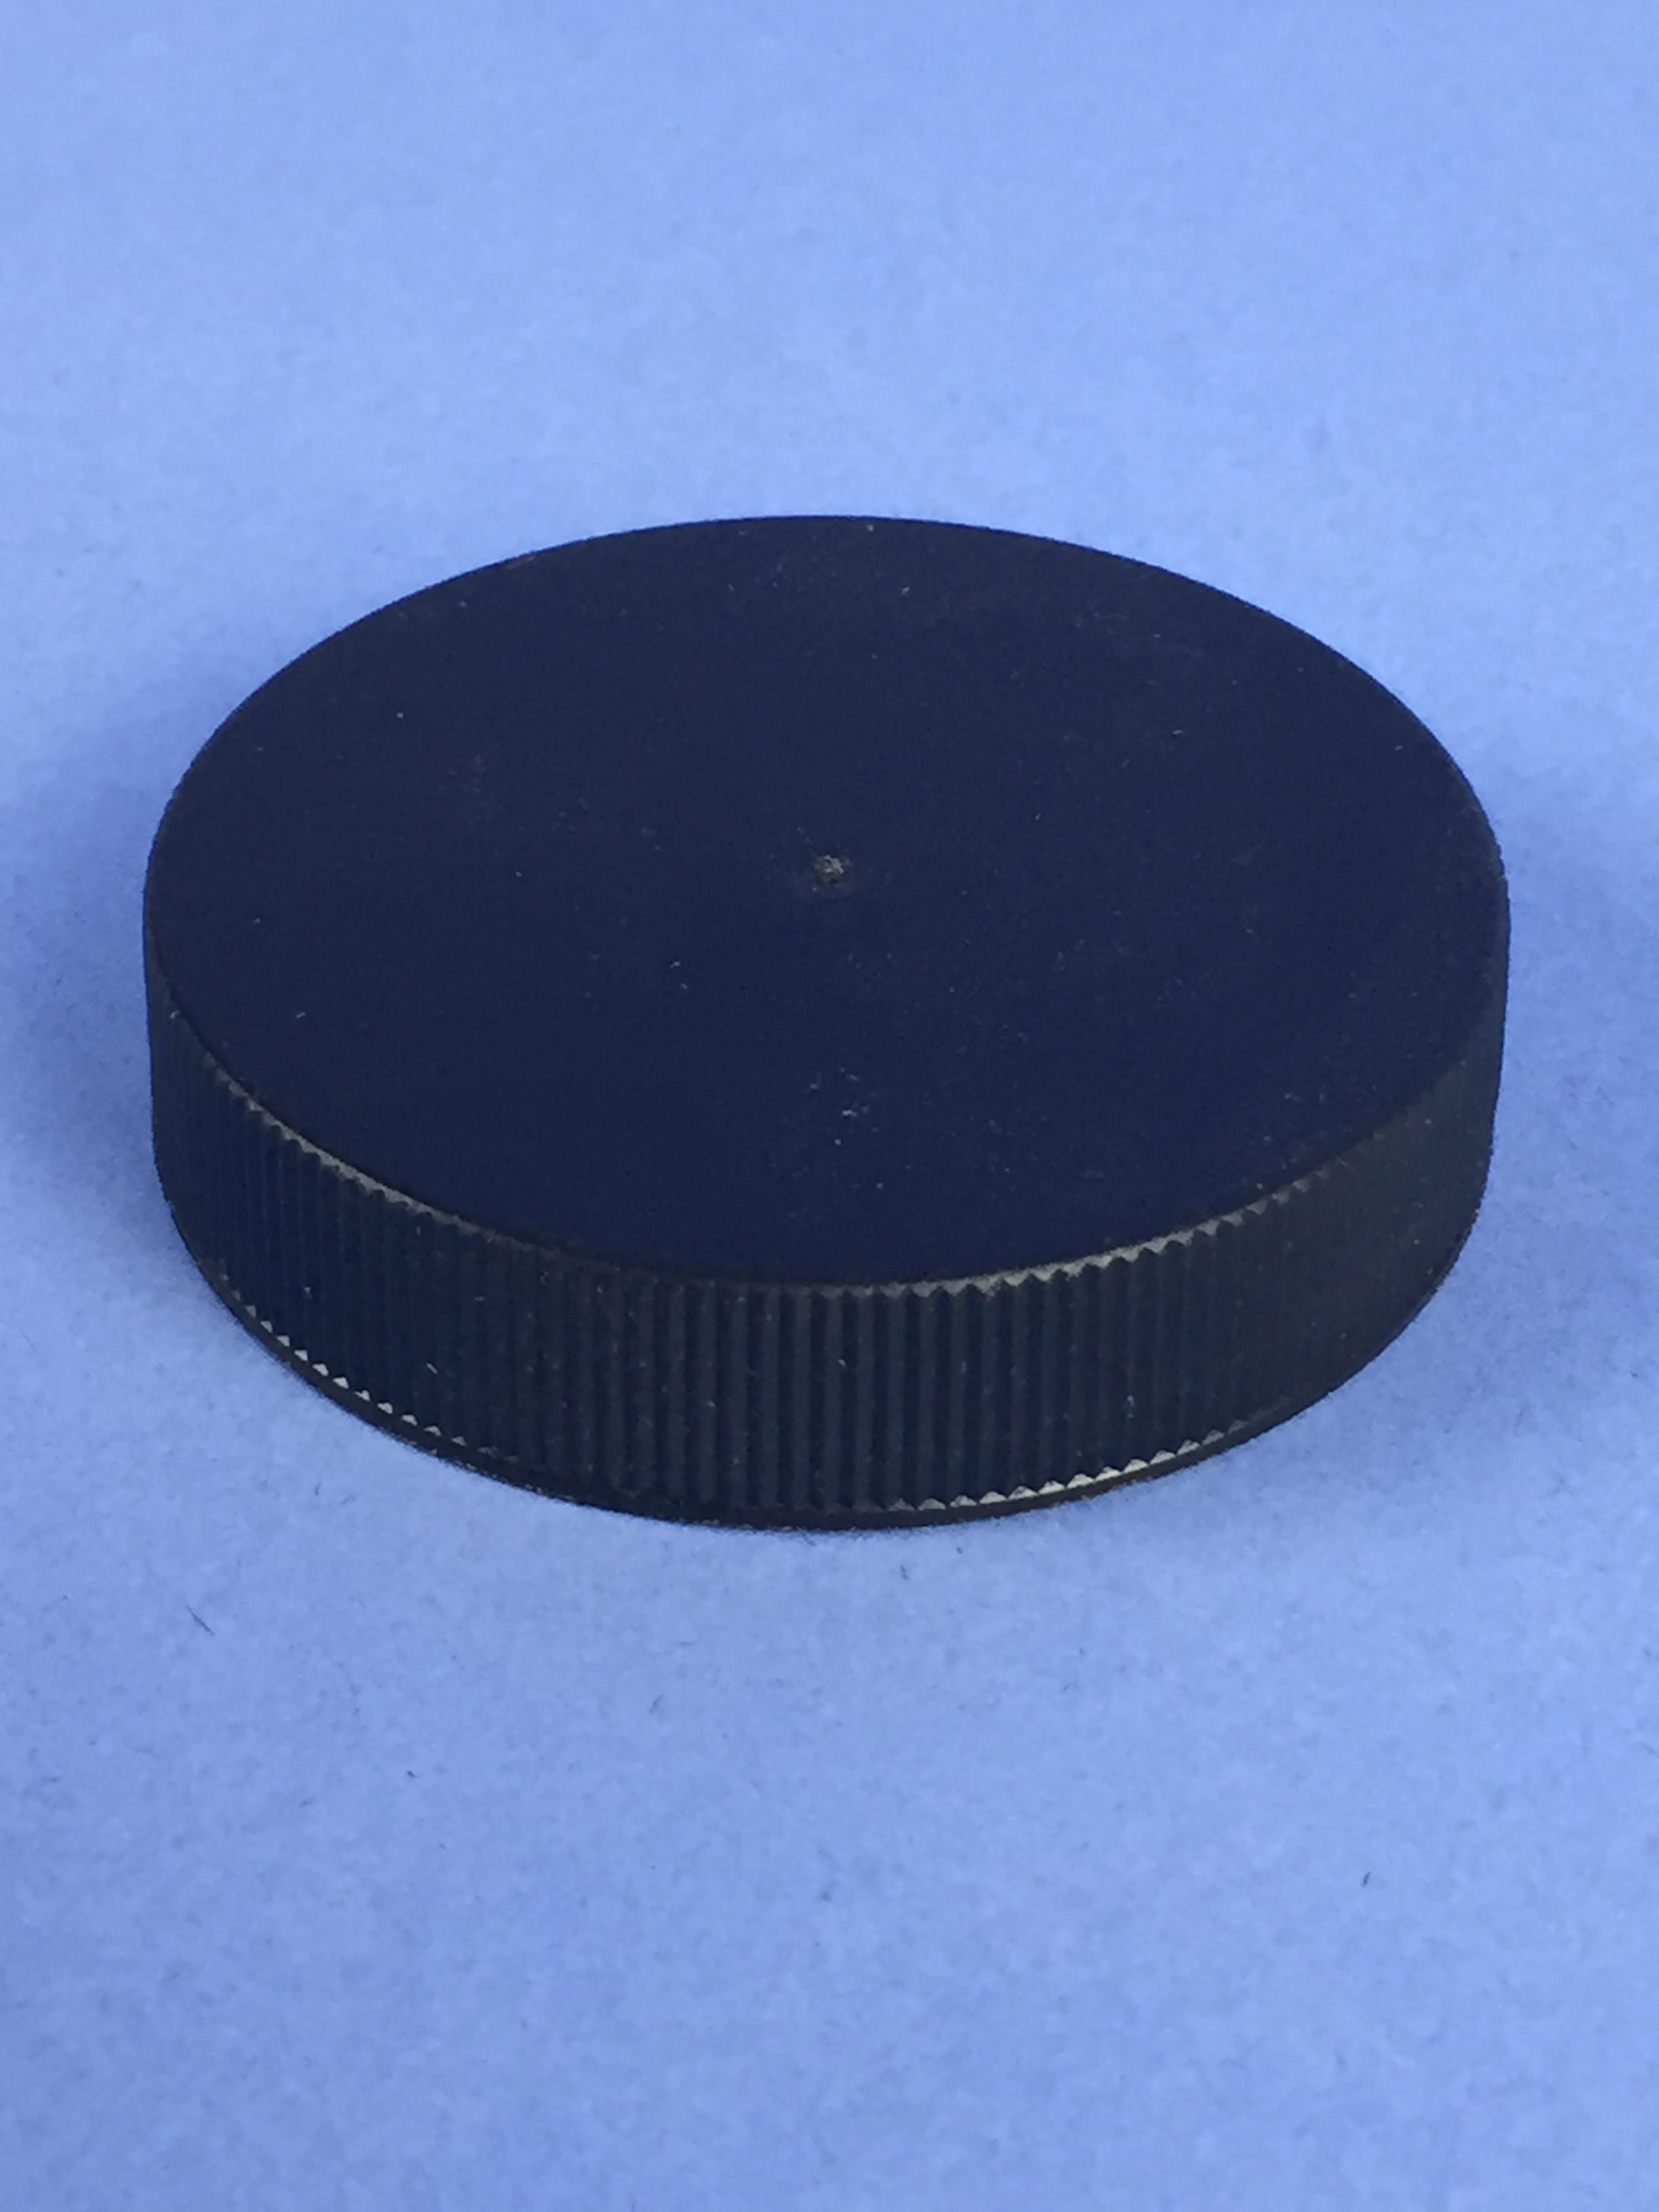 Black Lid For Wn4 Bottle Bristol Plastics Amp Containers